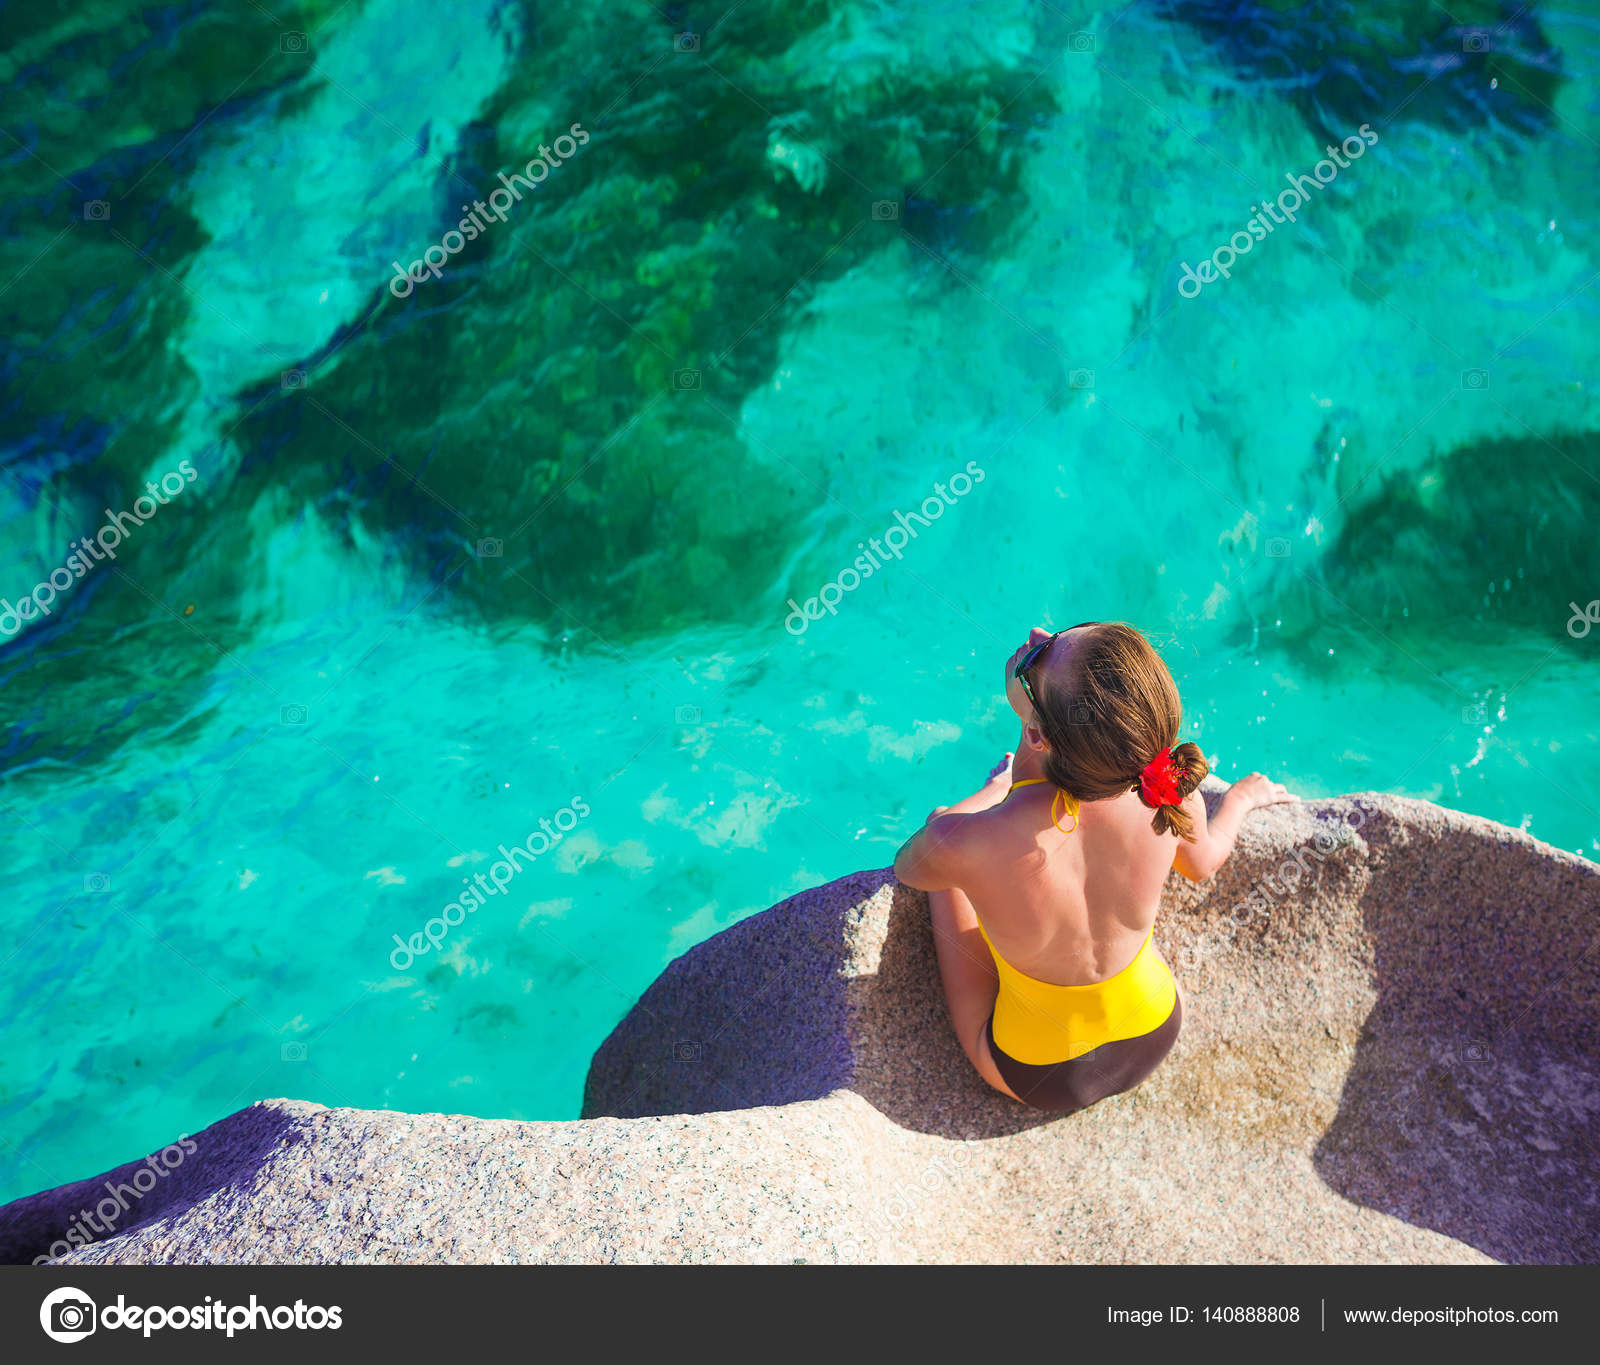 Seychelles Relaxing i63h5